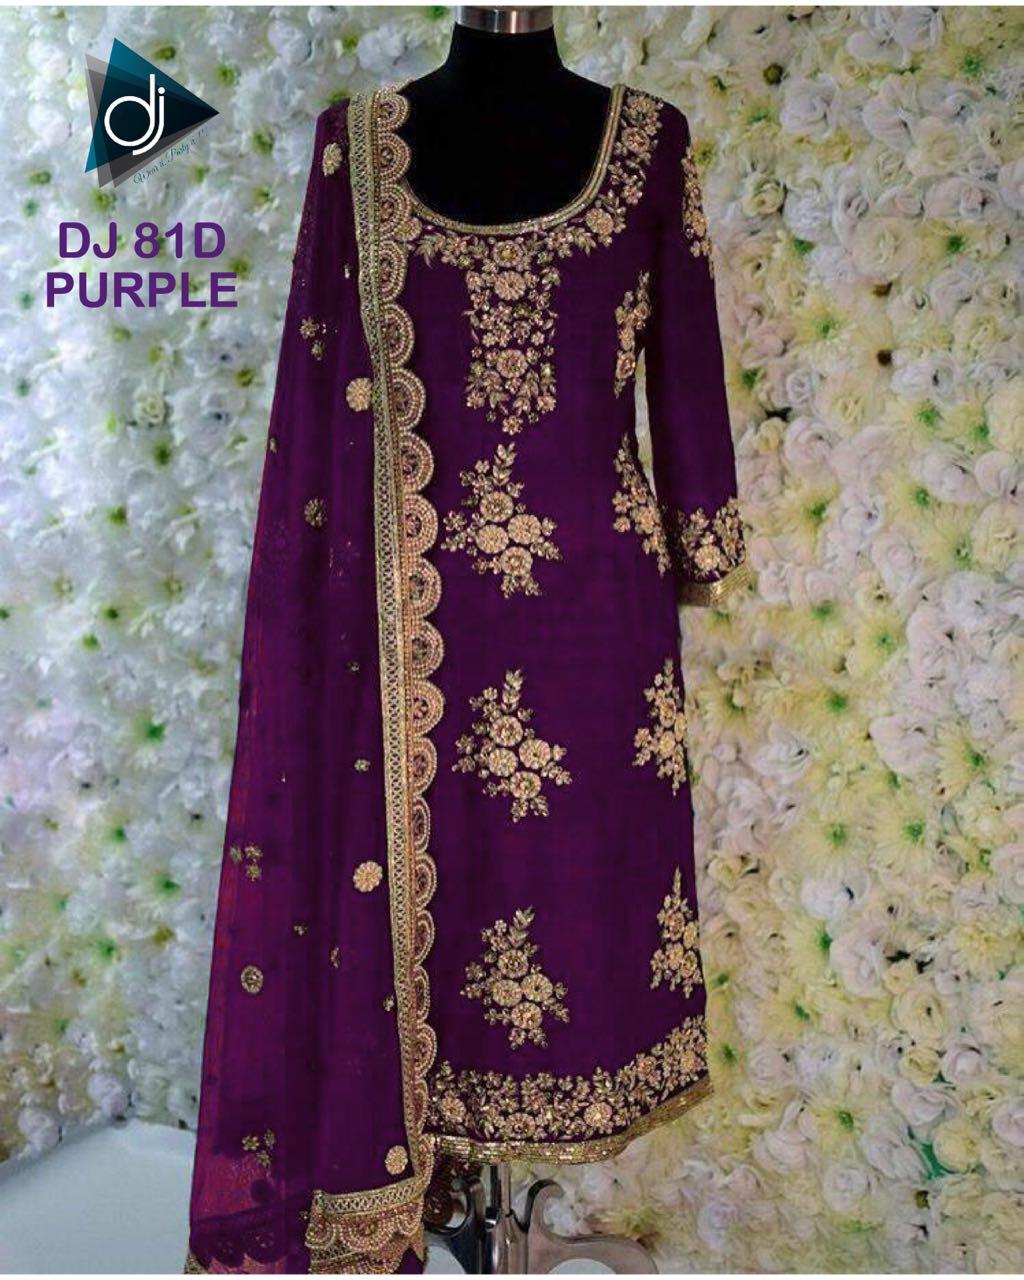 Deep Jyoti Creation DJ 81D Purple